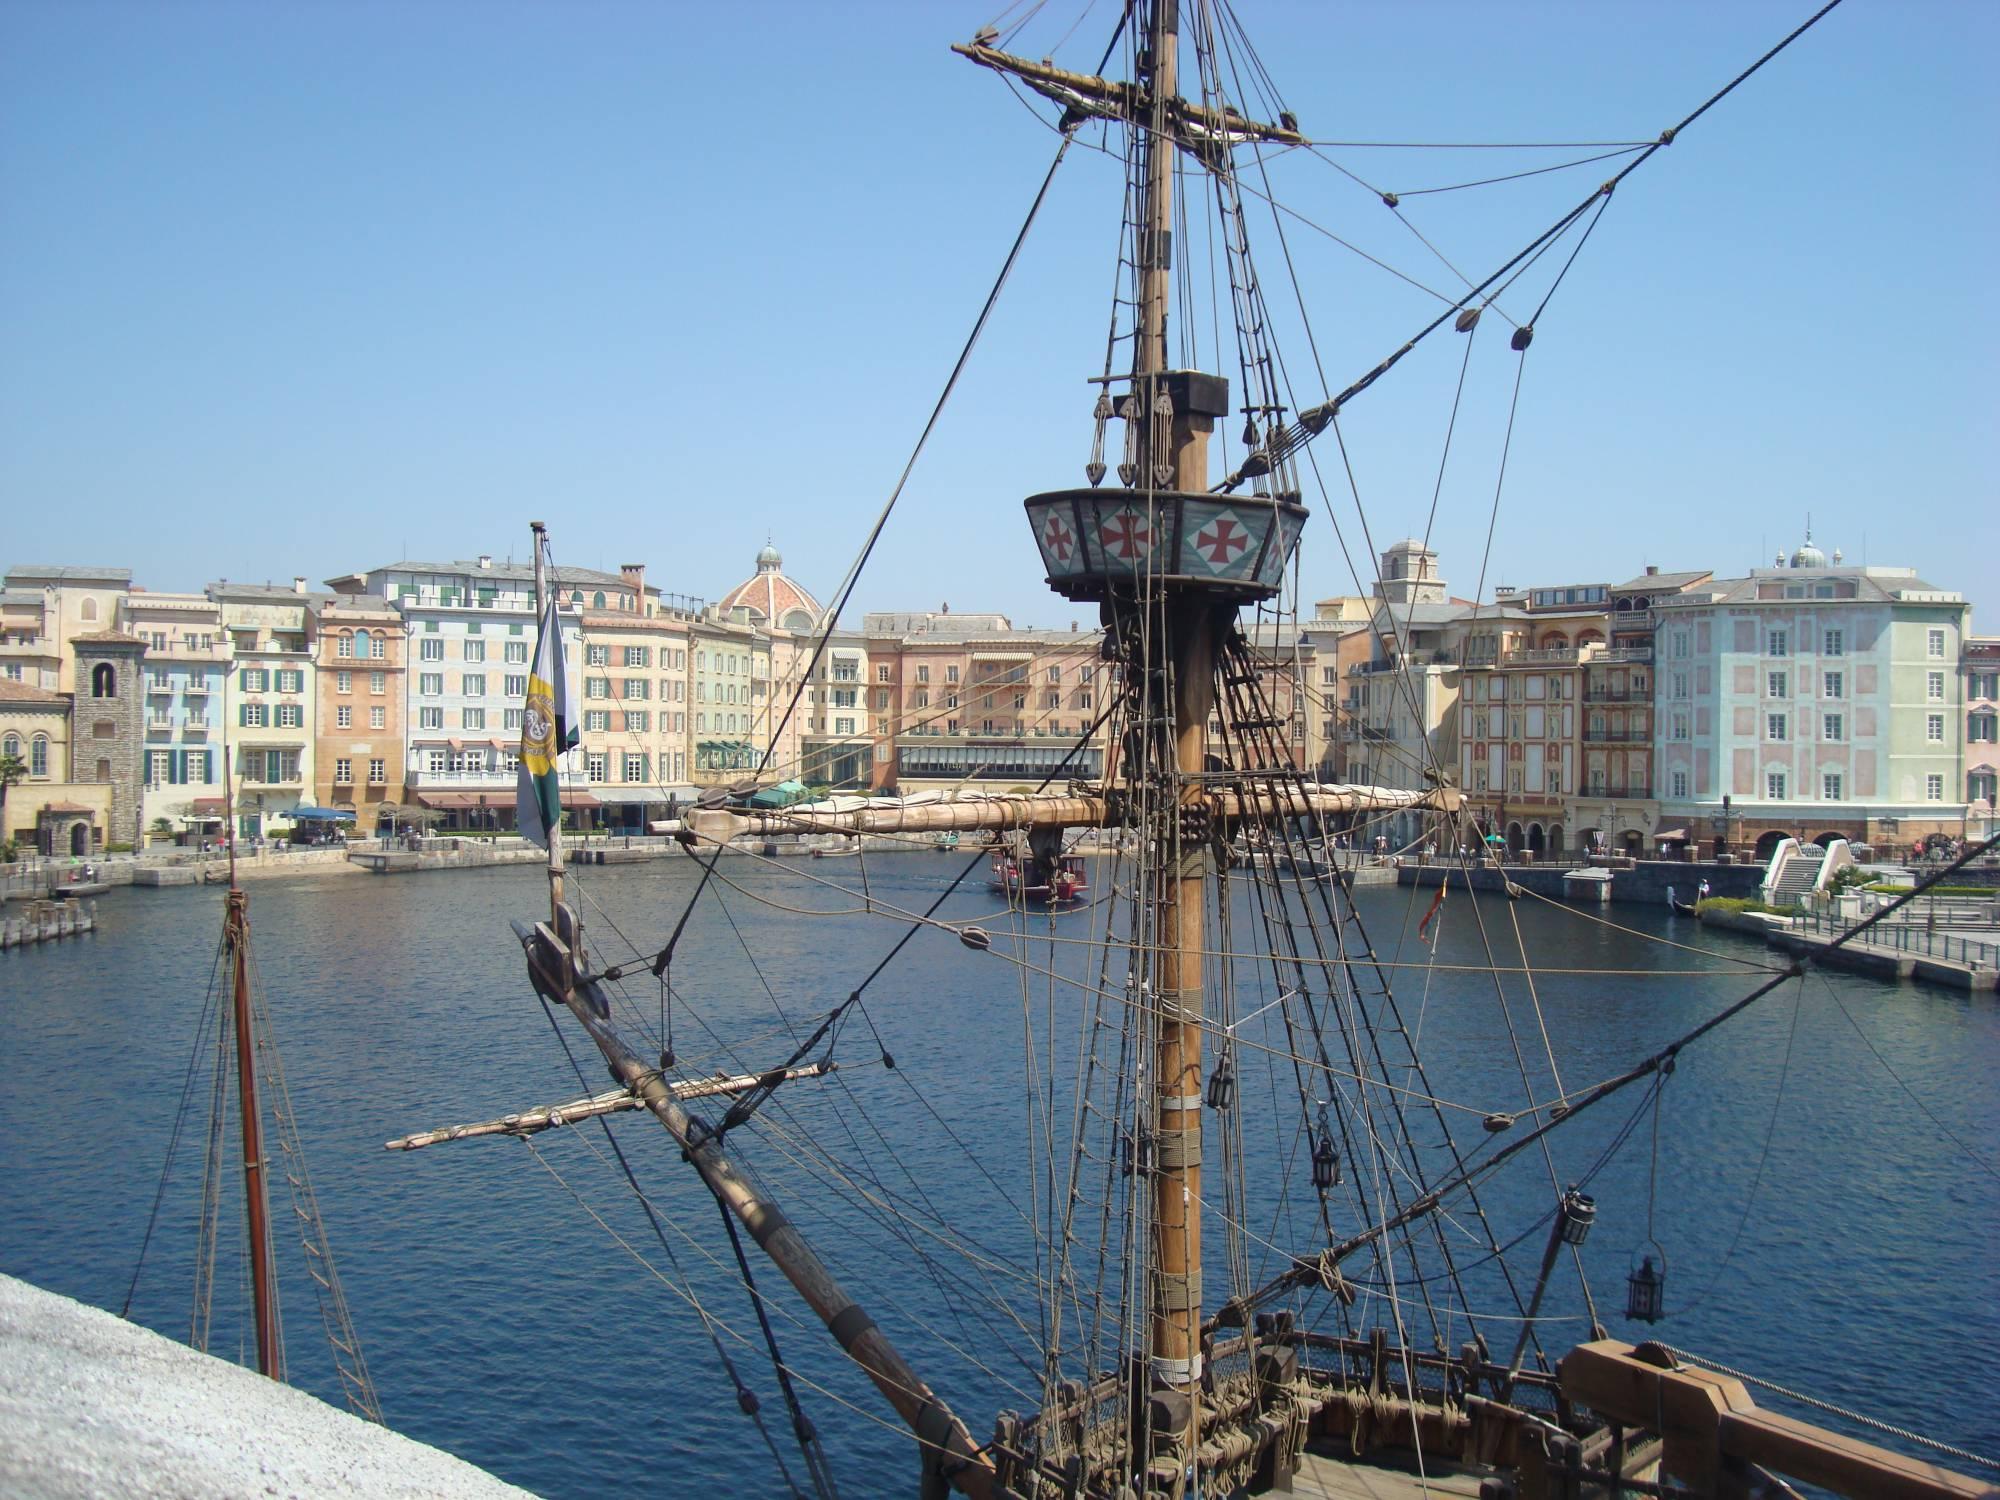 Tokyo DisneySea - Renaissance sailing ship